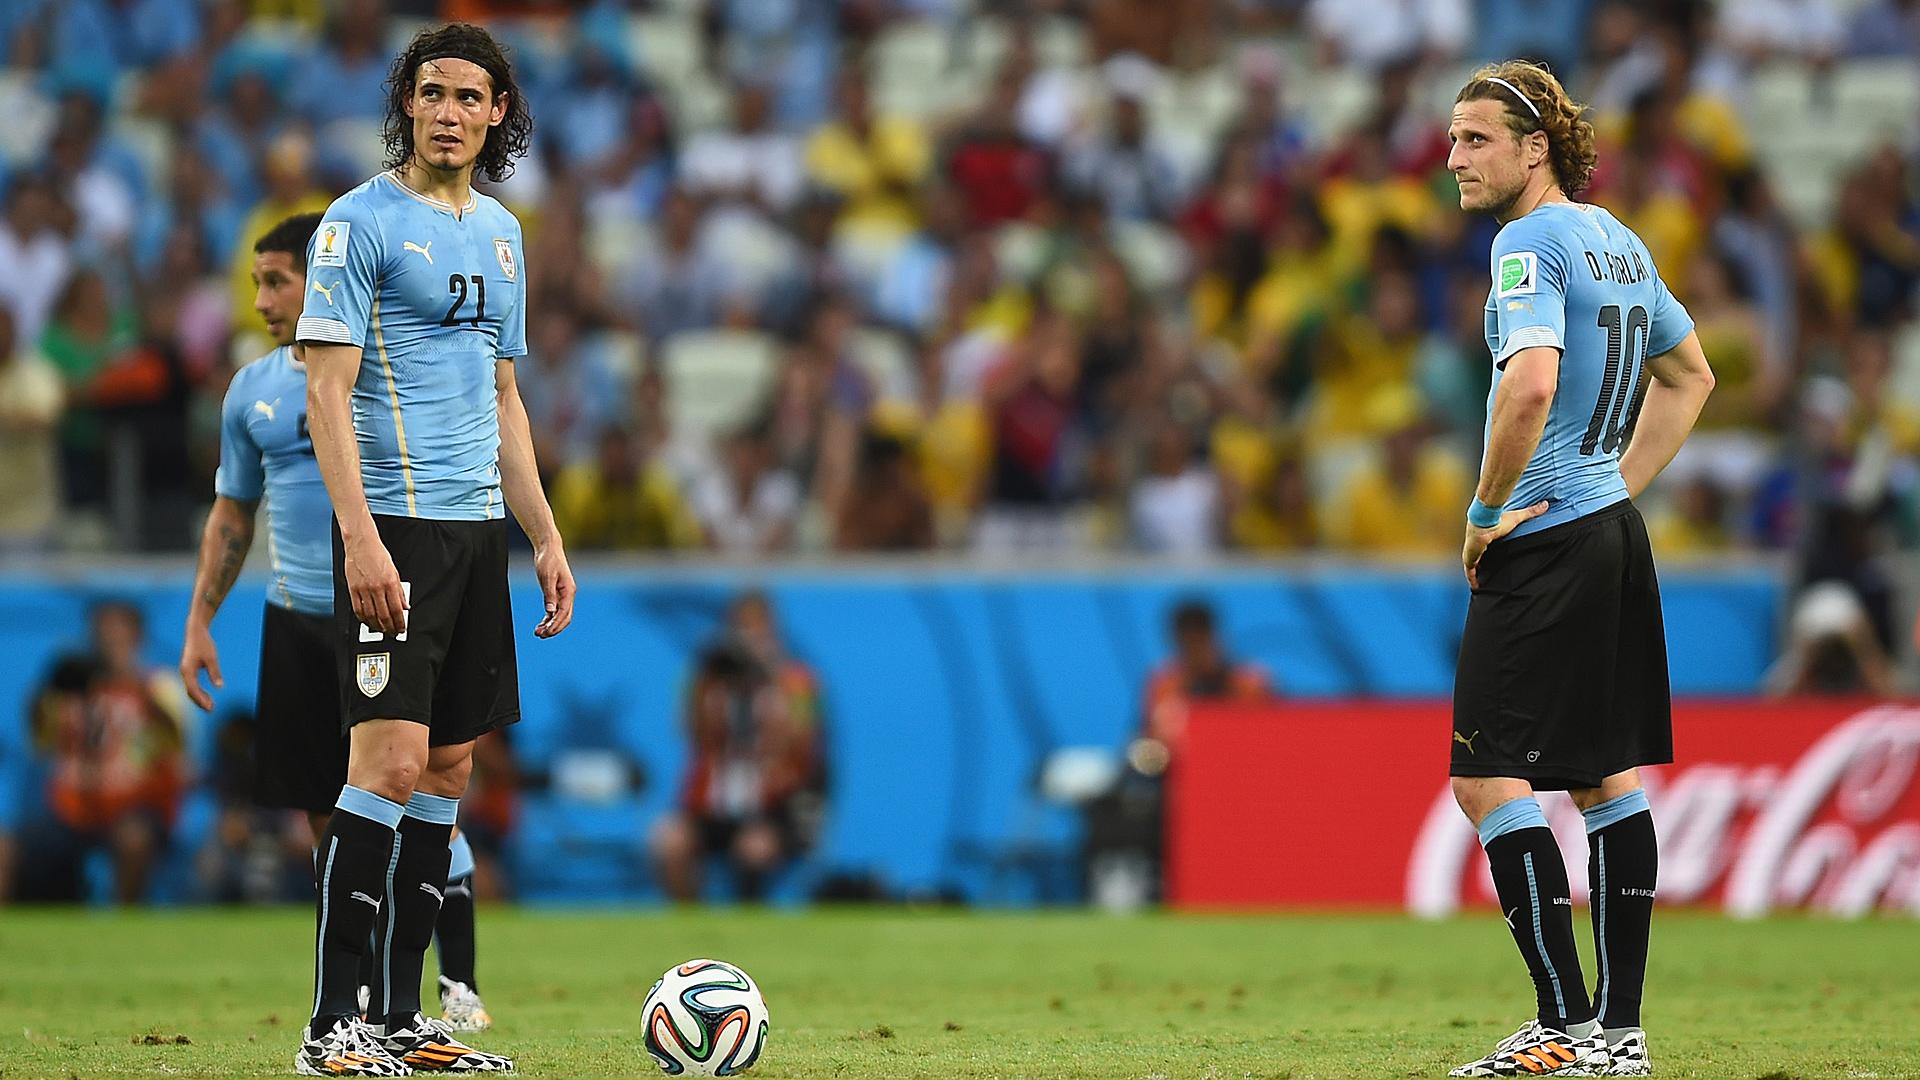 Forlan encourage Cavani à rejoindre Boca Juniors